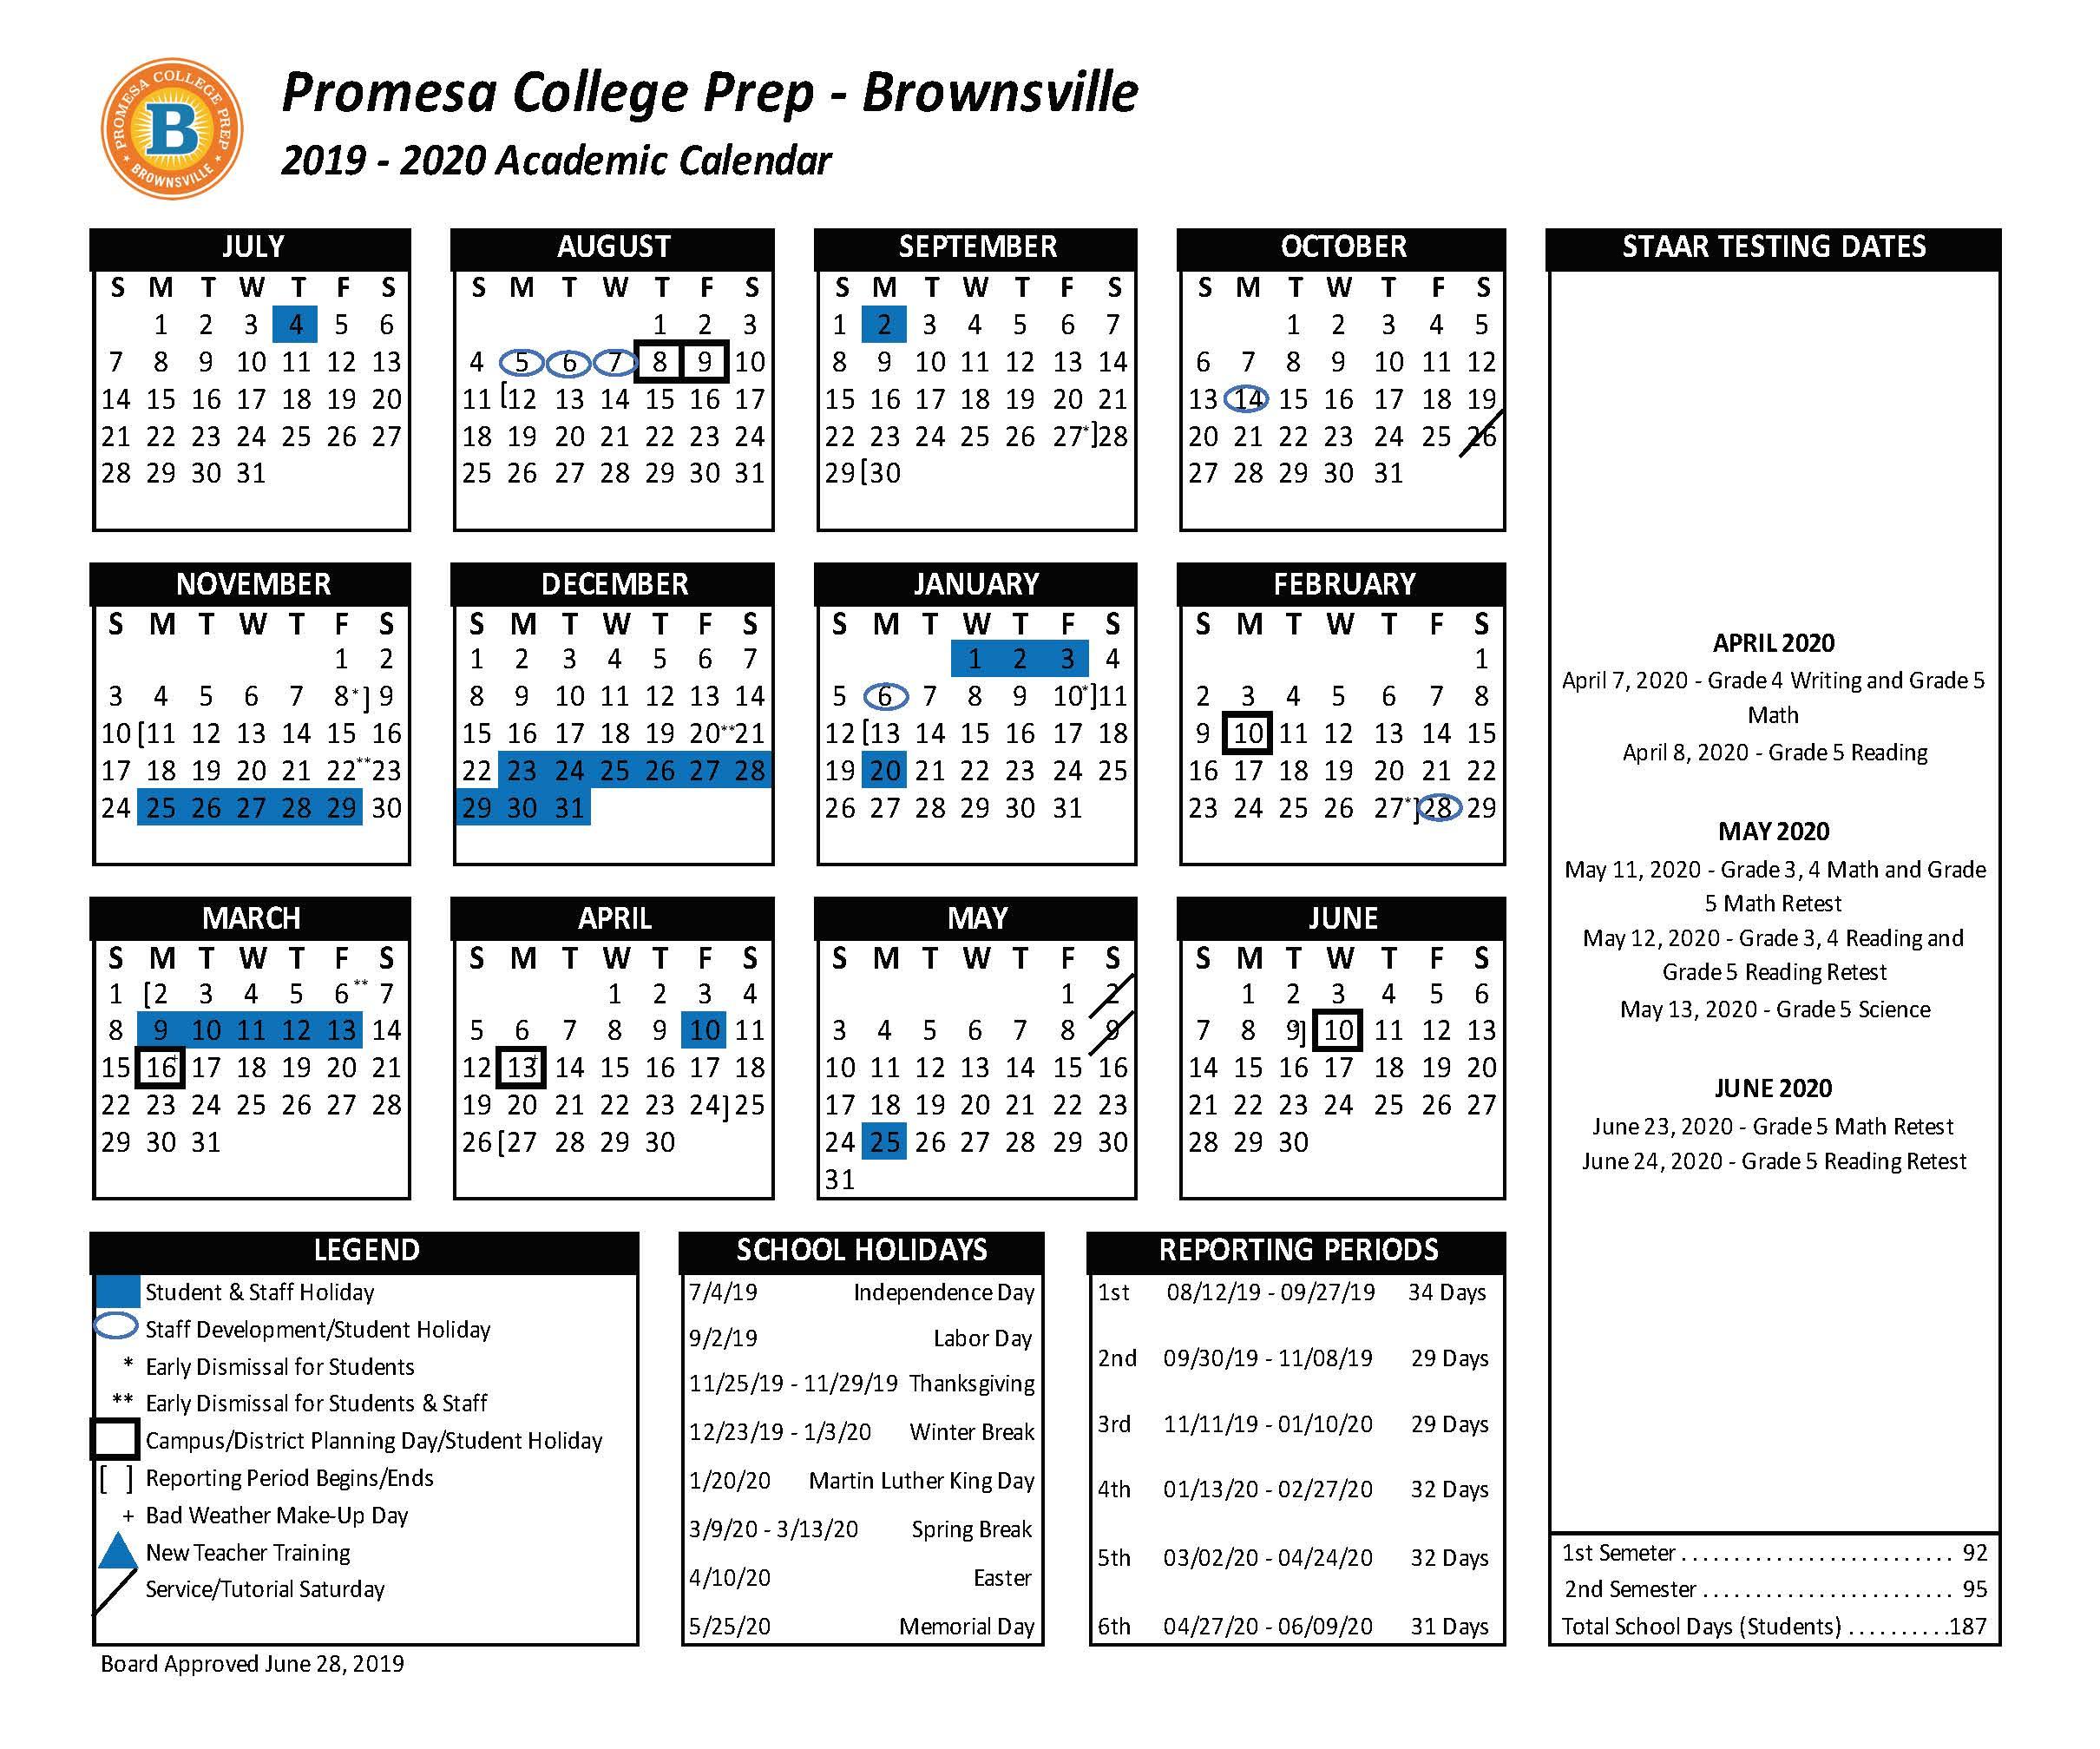 Brownsville Isd Calendar 2021 | Printable Calendar 2020 2021 Regarding American River College Academic Calendar 2021